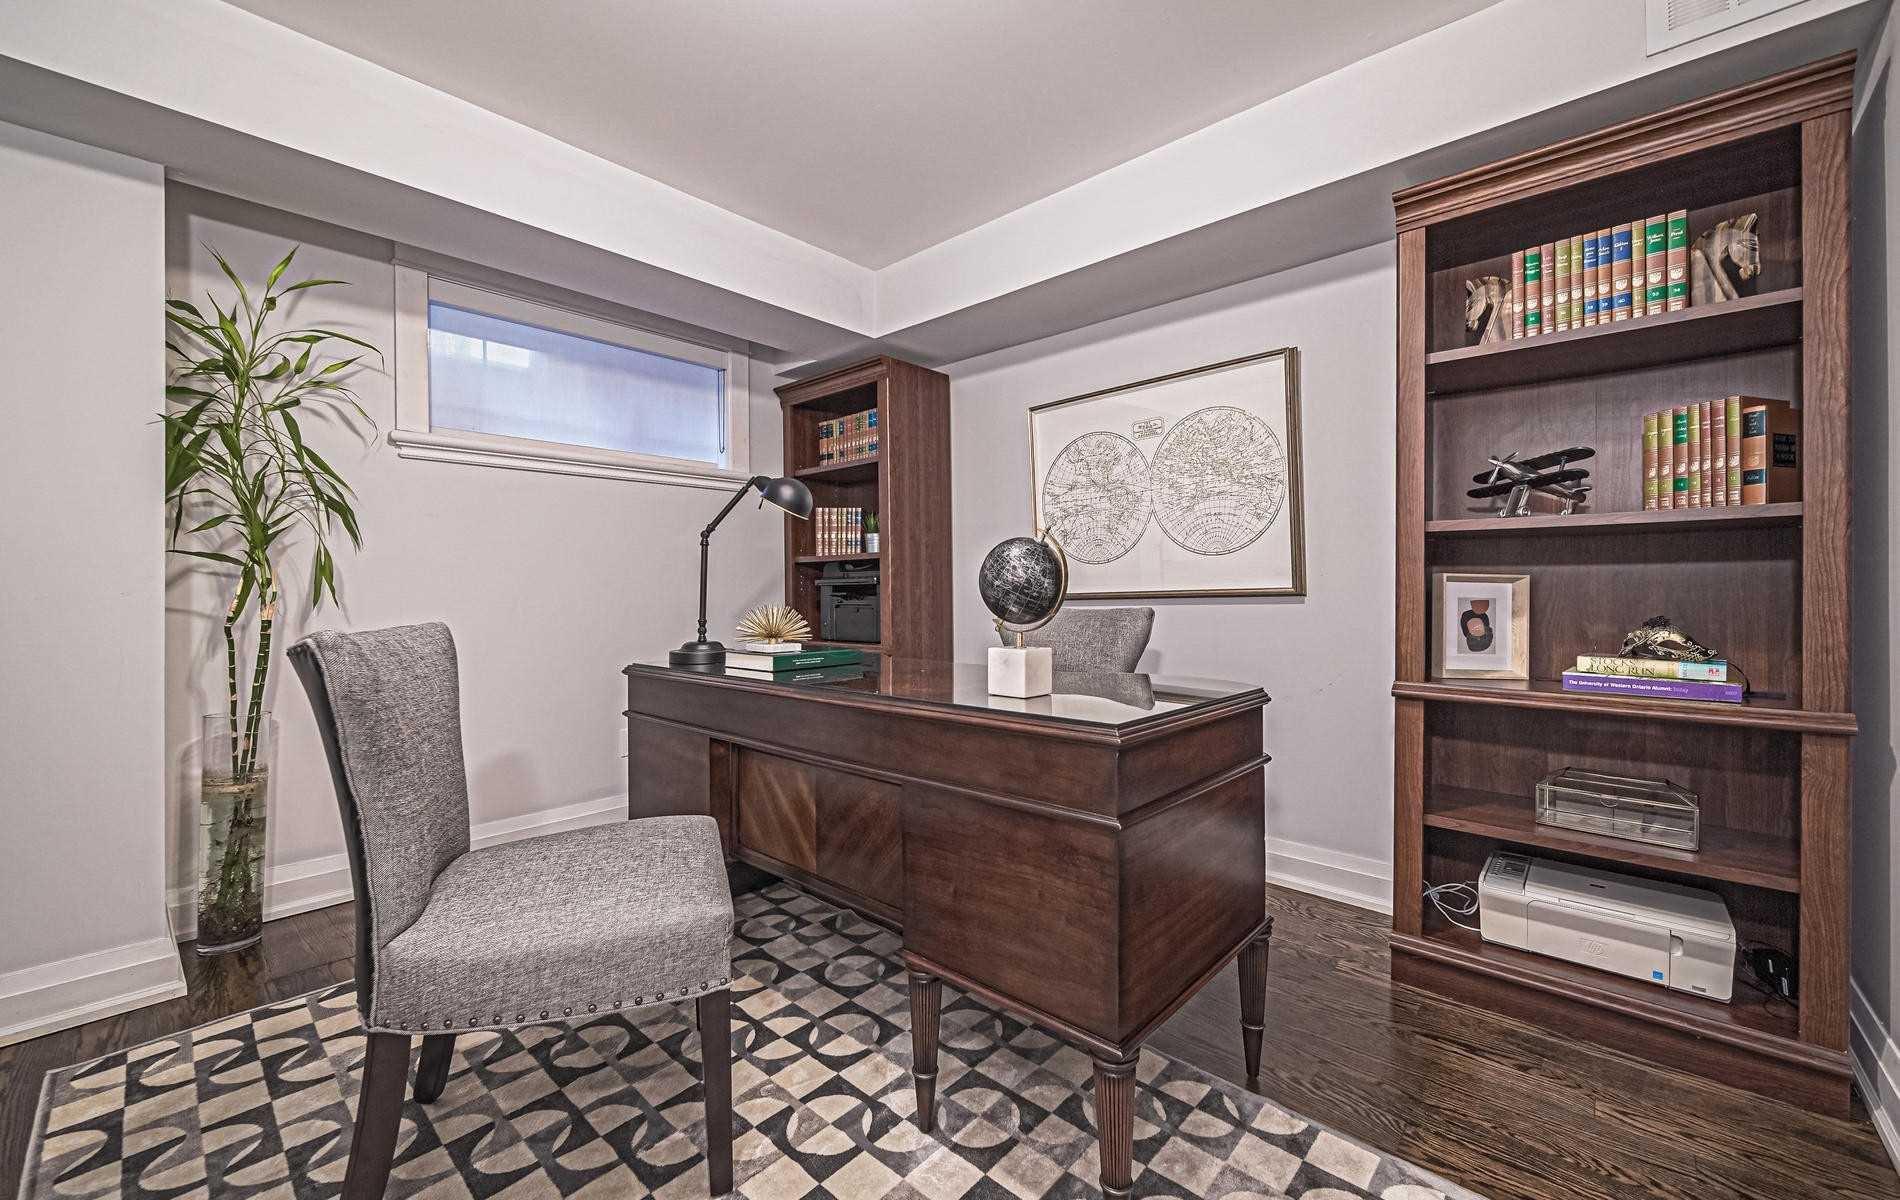 Photo 16: Photos: 216A Hamilton Street in Toronto: South Riverdale House (3-Storey) for sale (Toronto E01)  : MLS®# E4619870